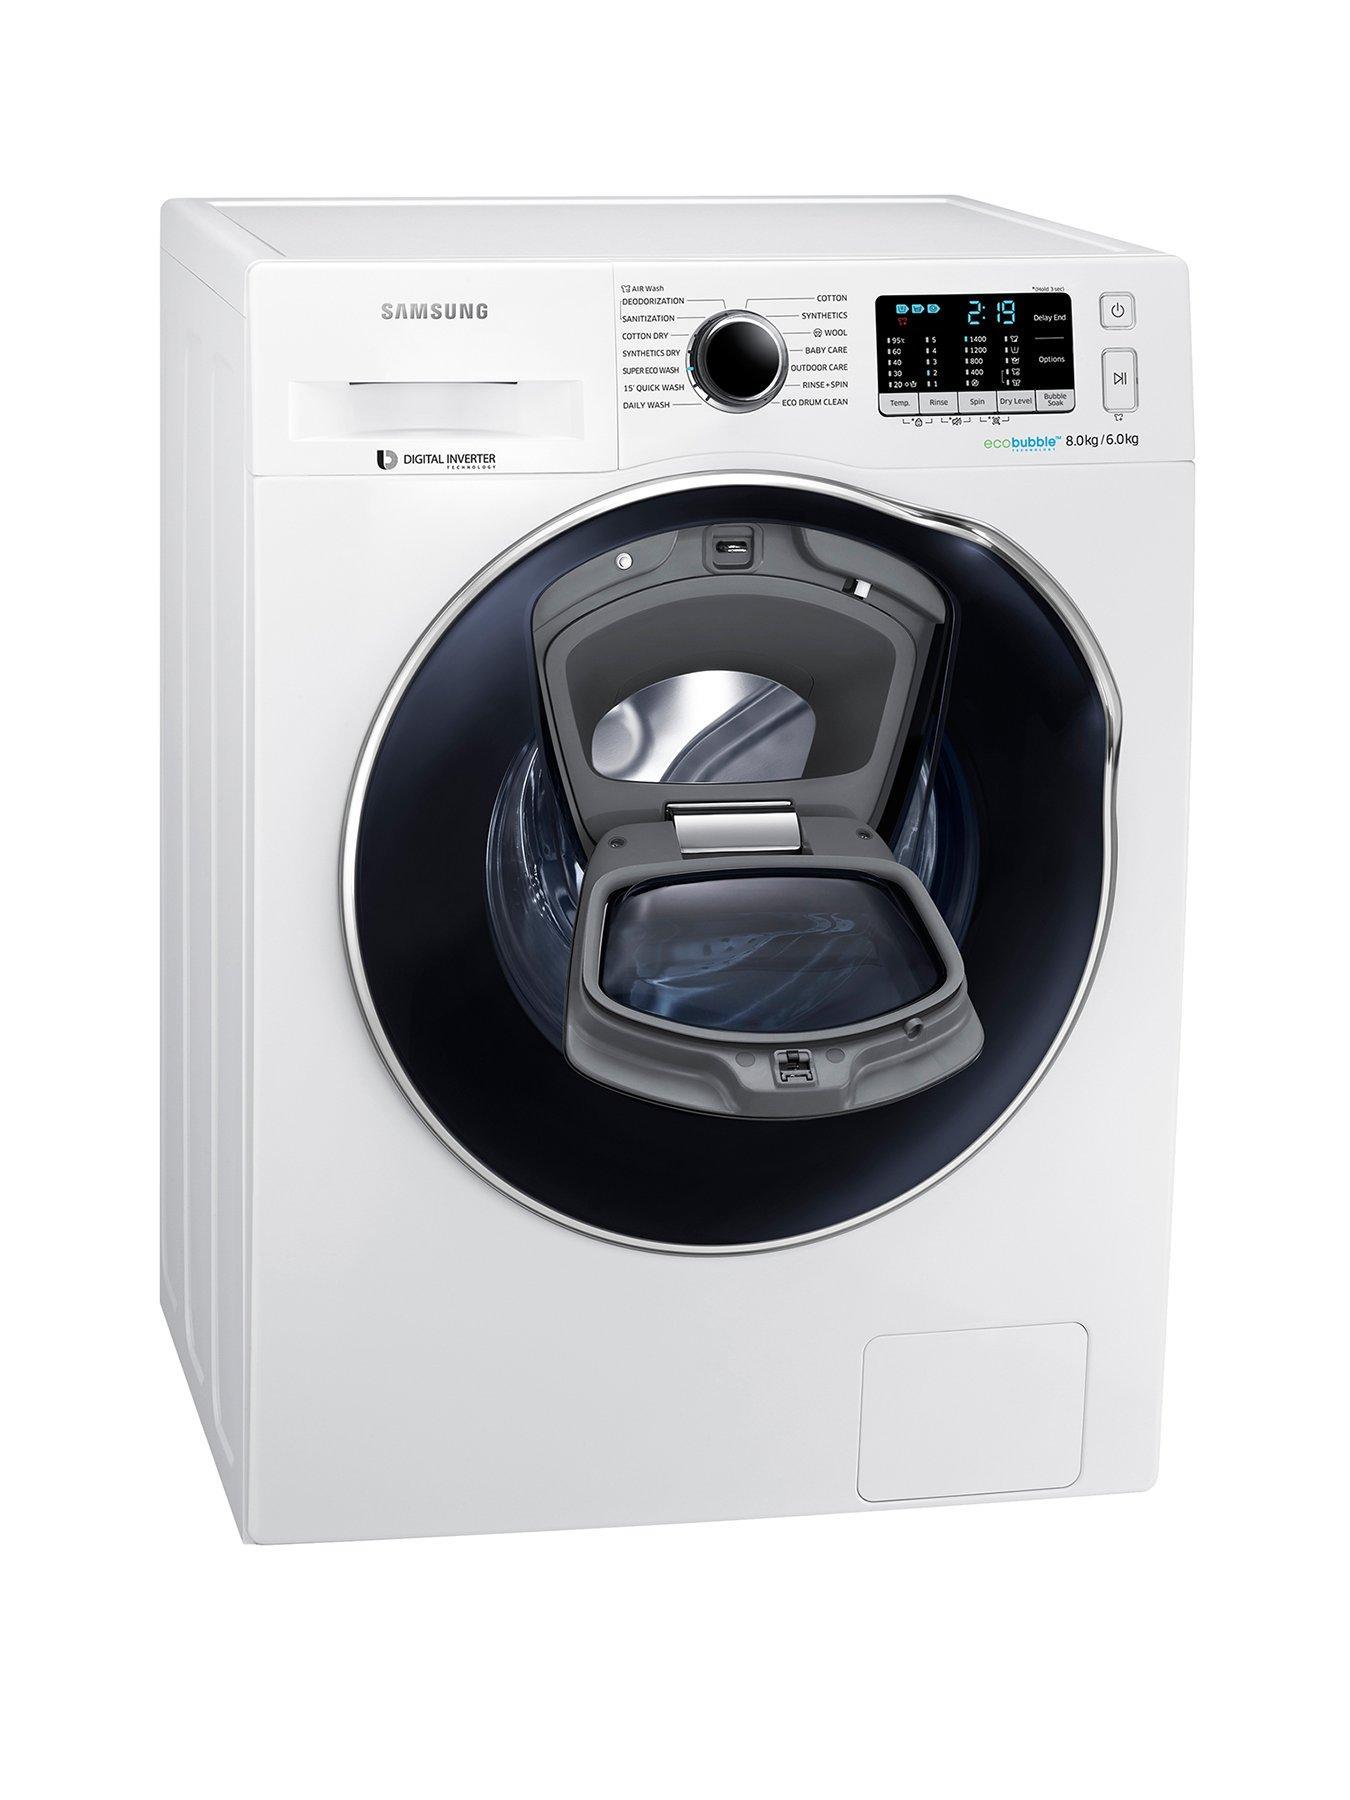 washing machine and tumble dryer deals